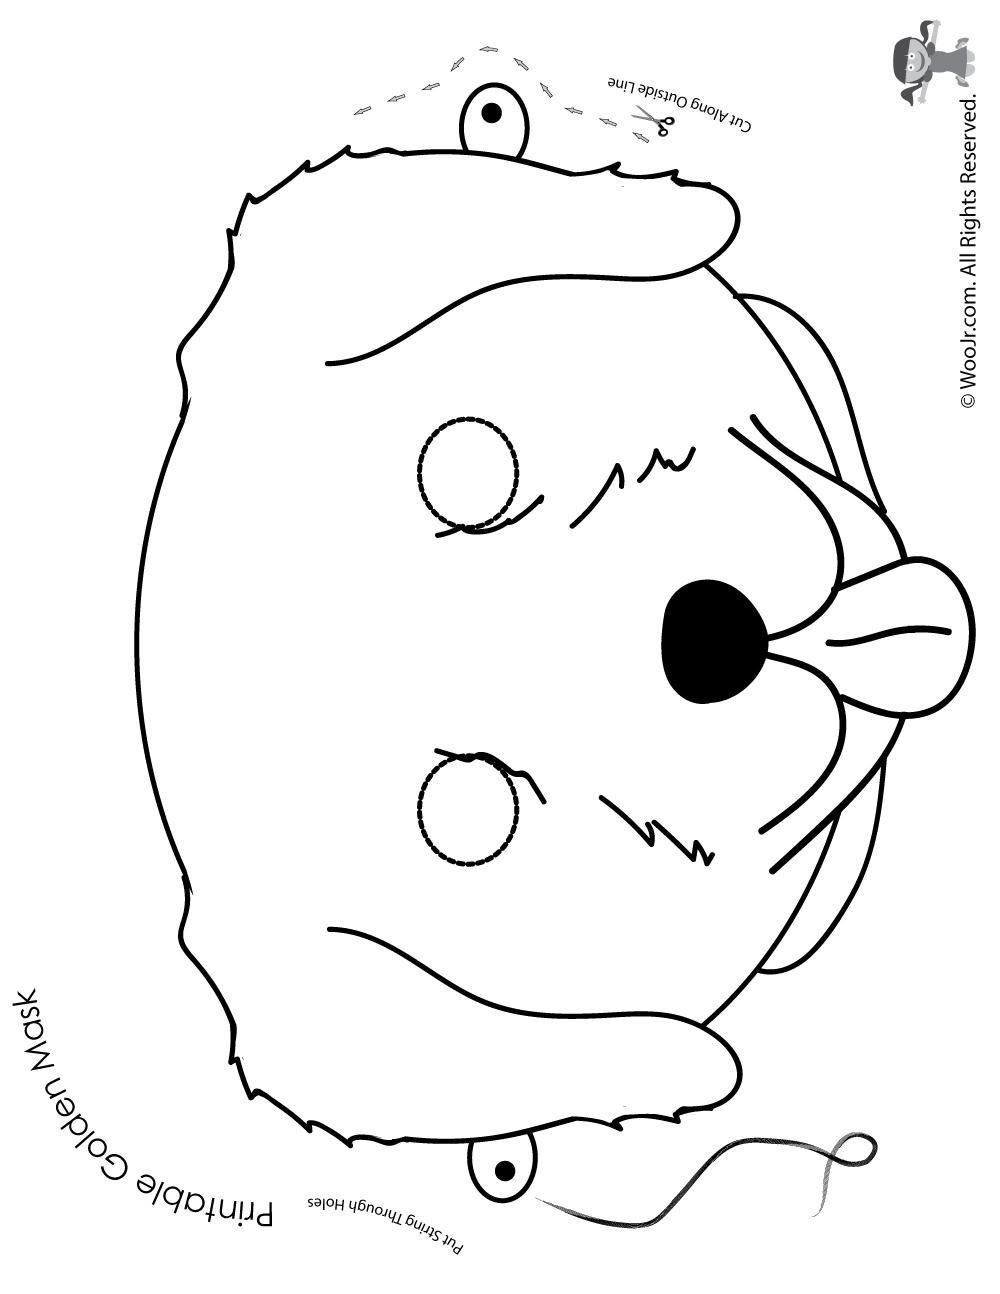 Dog Mask Printable: Golden Retriever Mask - Coloring Page